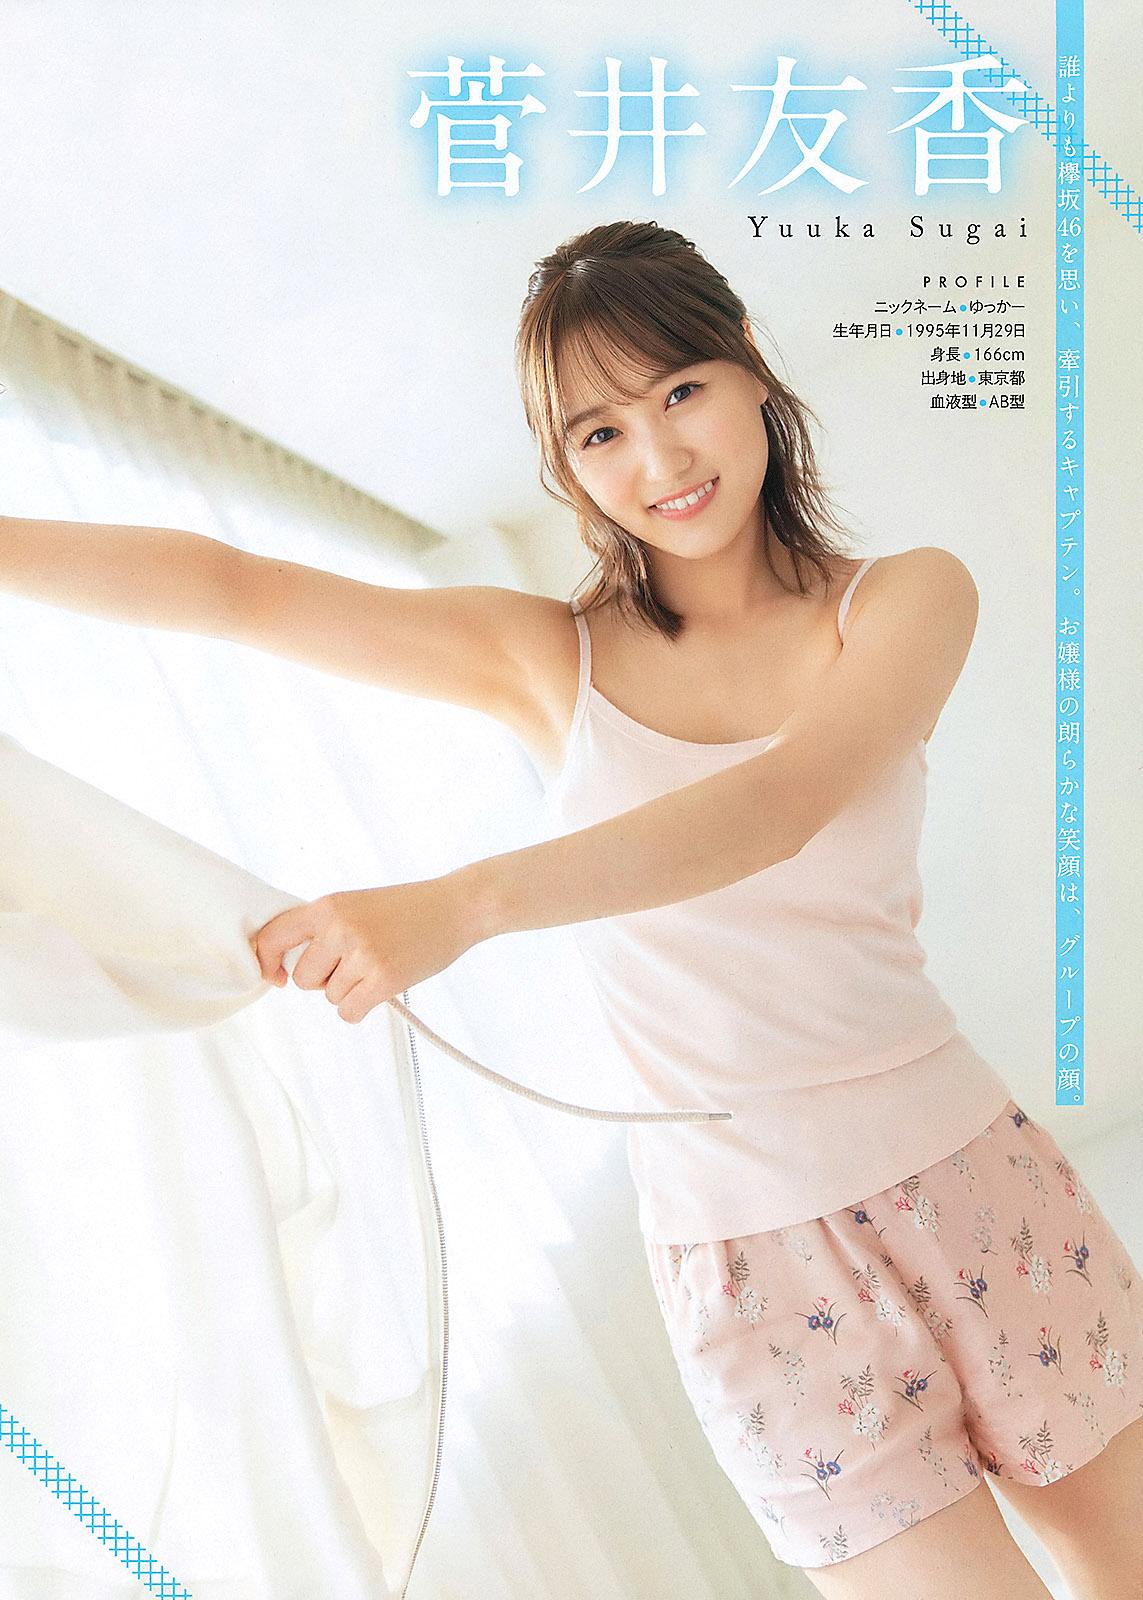 K46 Young Magazine 200101 03.jpg